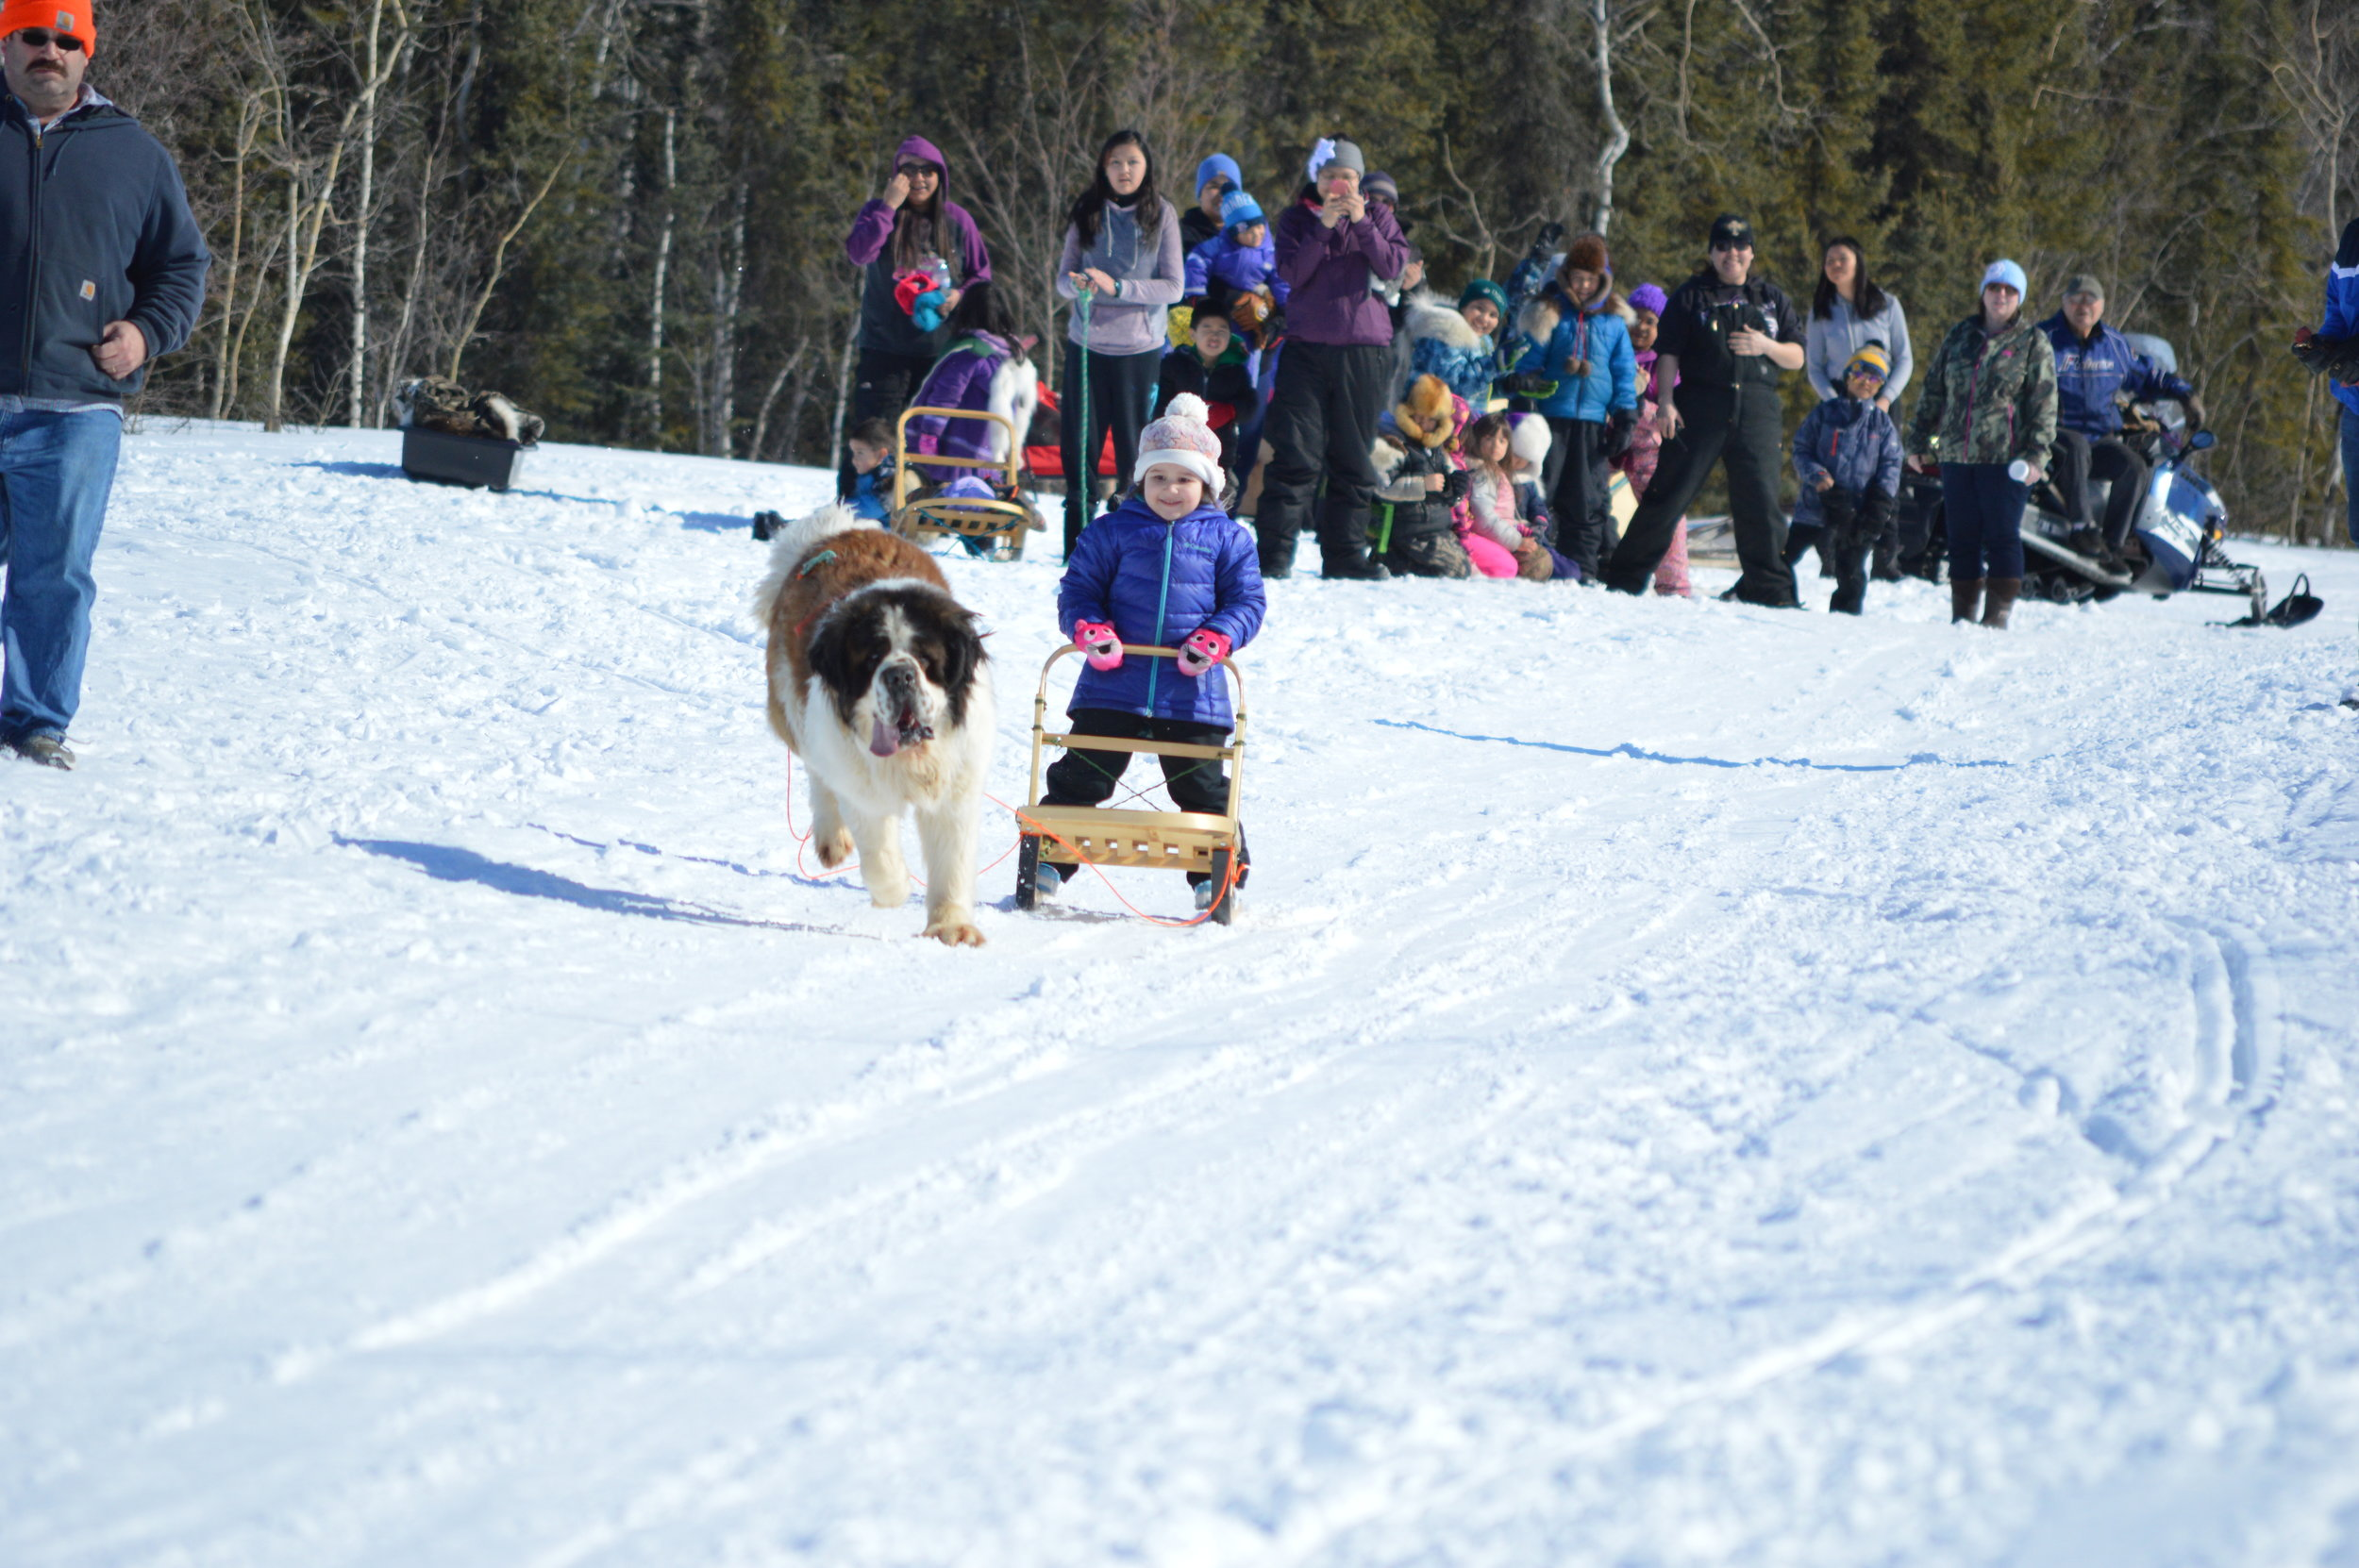 Huslia Jr. Carnival - one-dog racer with St. Bernard.